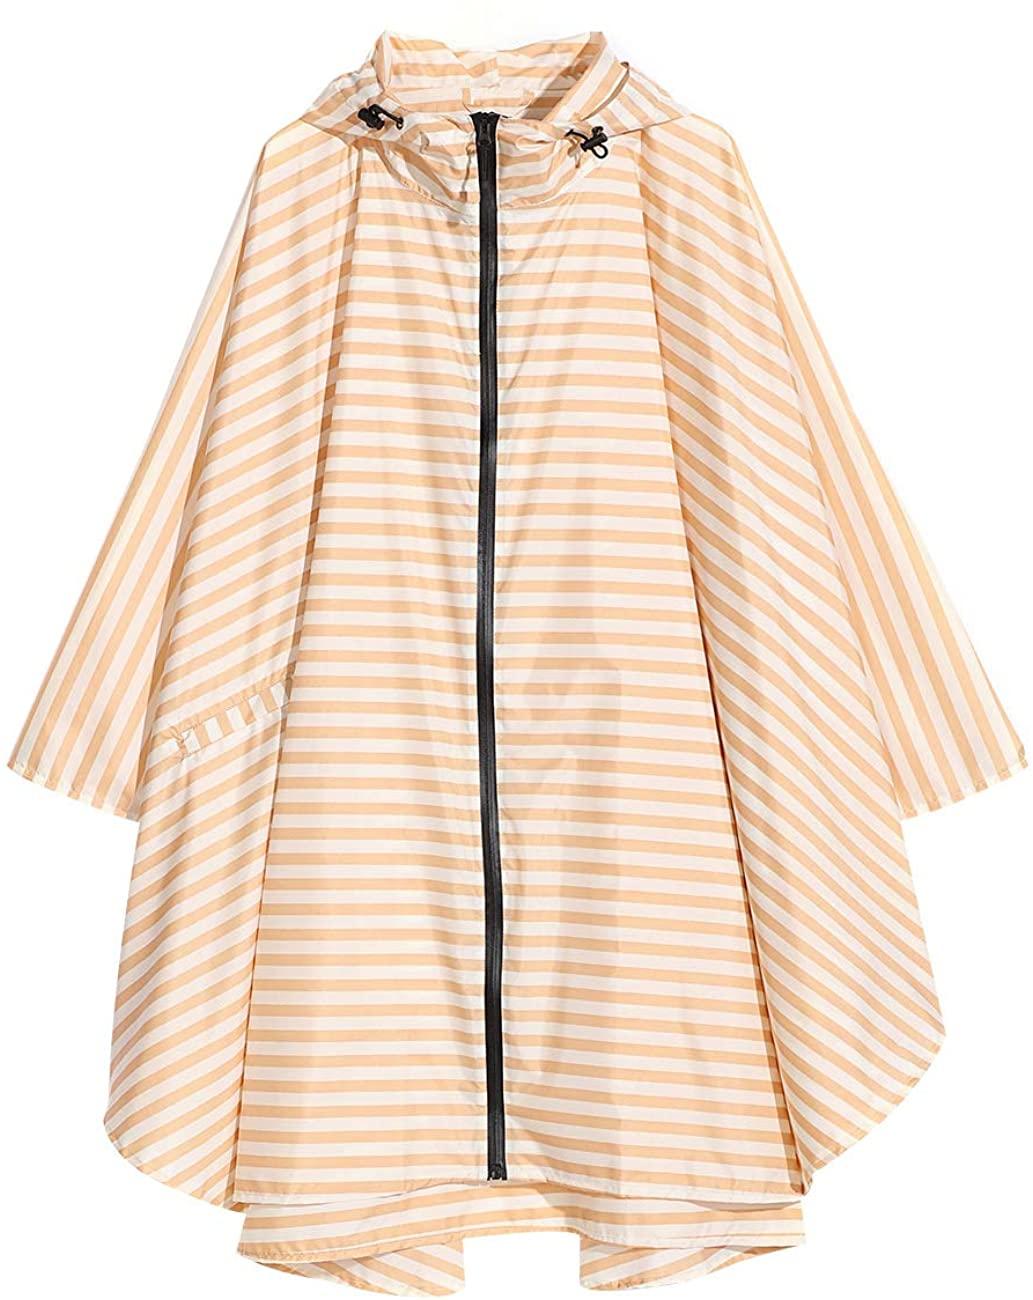 Women's and Big Gril's Waterproof Raincoat Lightweight Packable Rain Coat Poncho Hooded Polka Dot